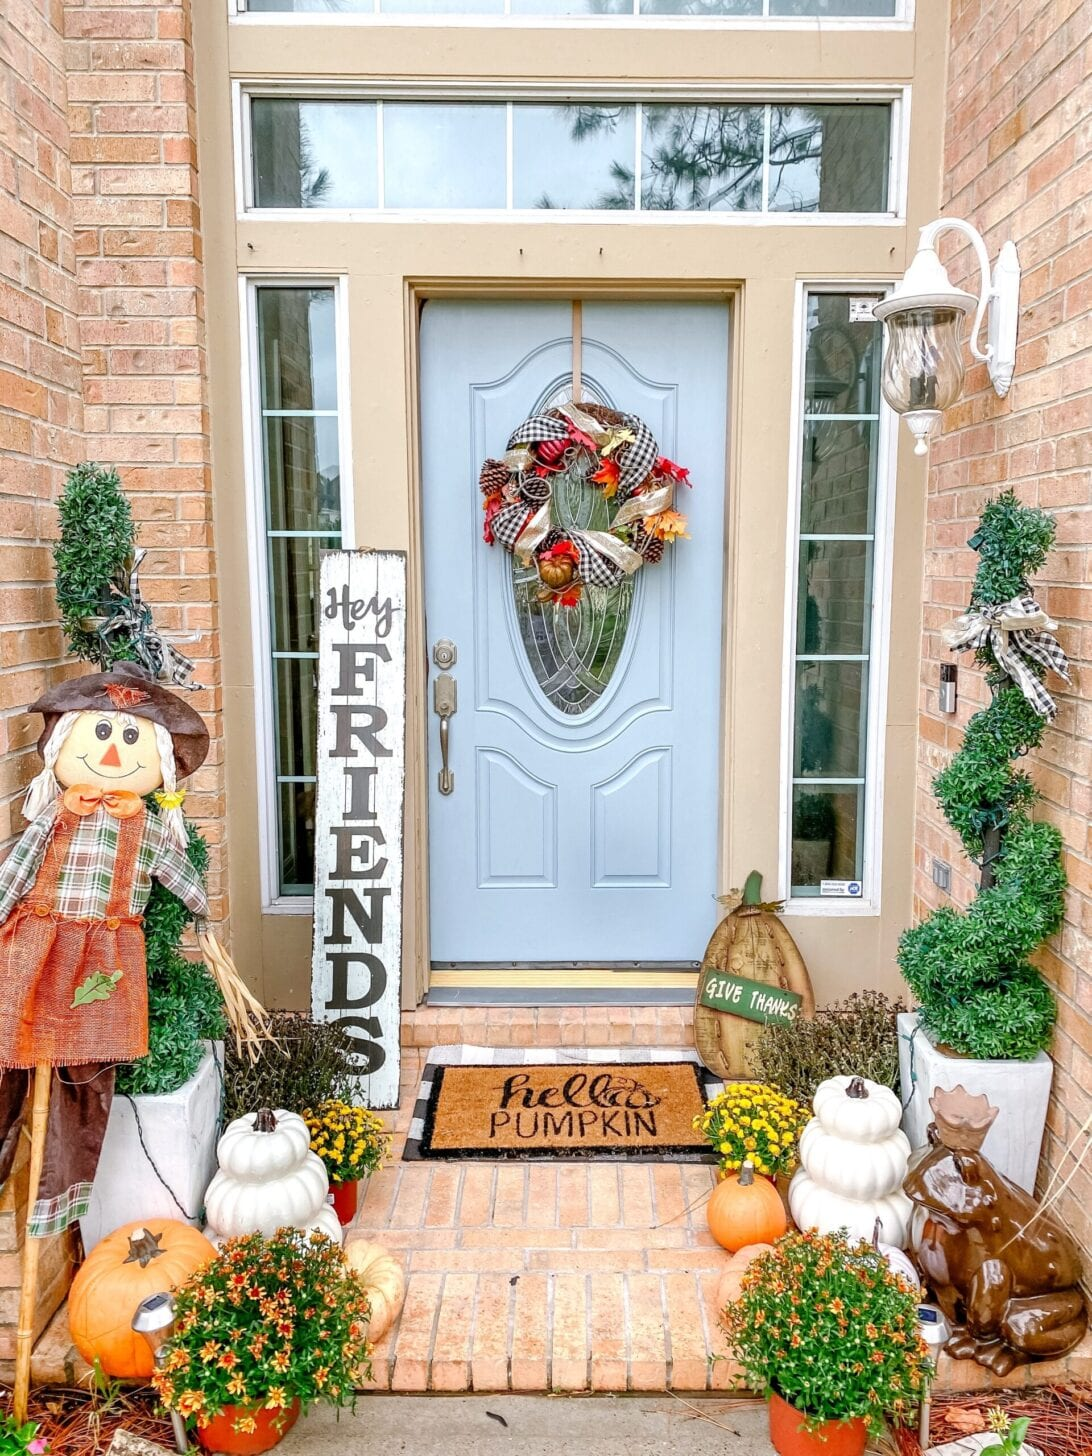 2020 fall home decor , hello pumpkin door mat, fall front porch decor, blue door